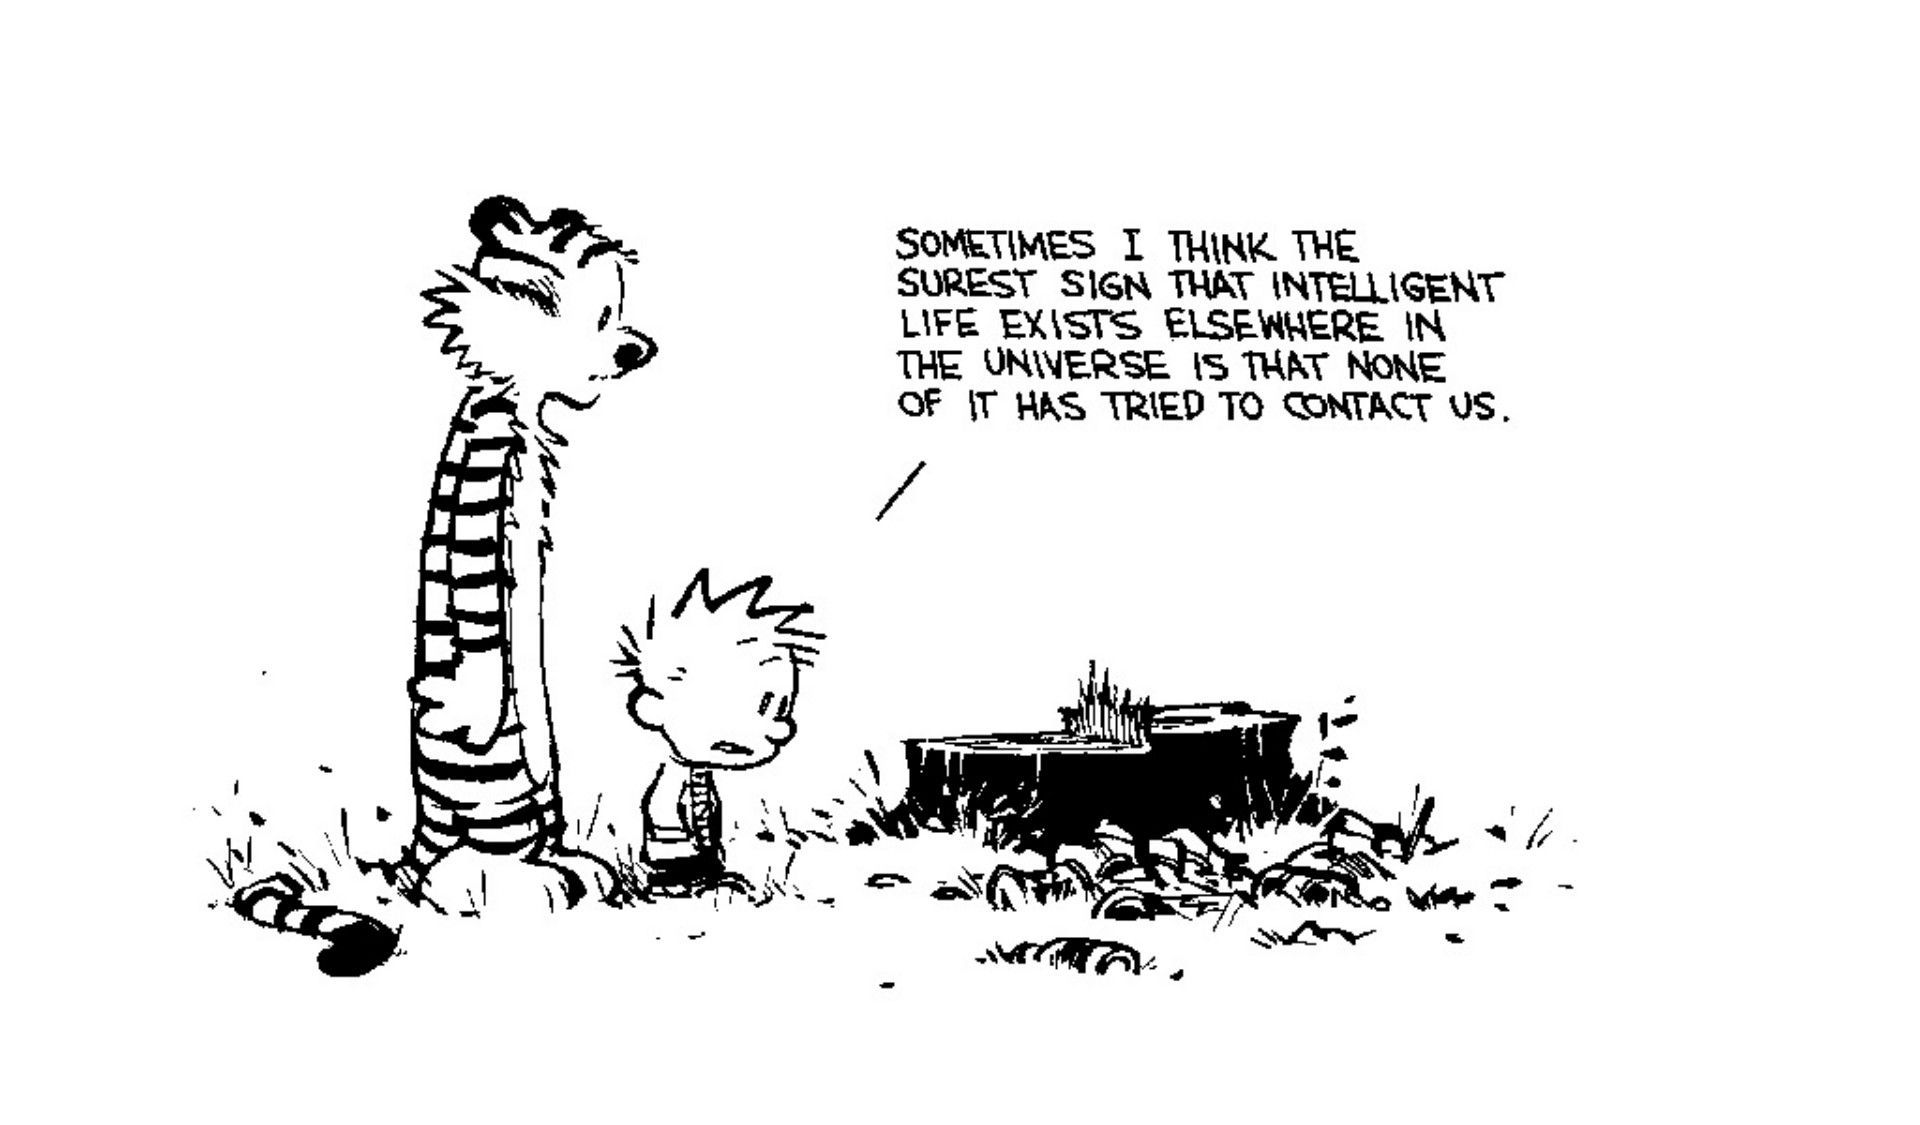 Pin by David Ives on Calvin and Hobbes Comic Strip | Calvin and hobbes  quotes, Calvin and hobbes wallpaper, Calvin and hobbes